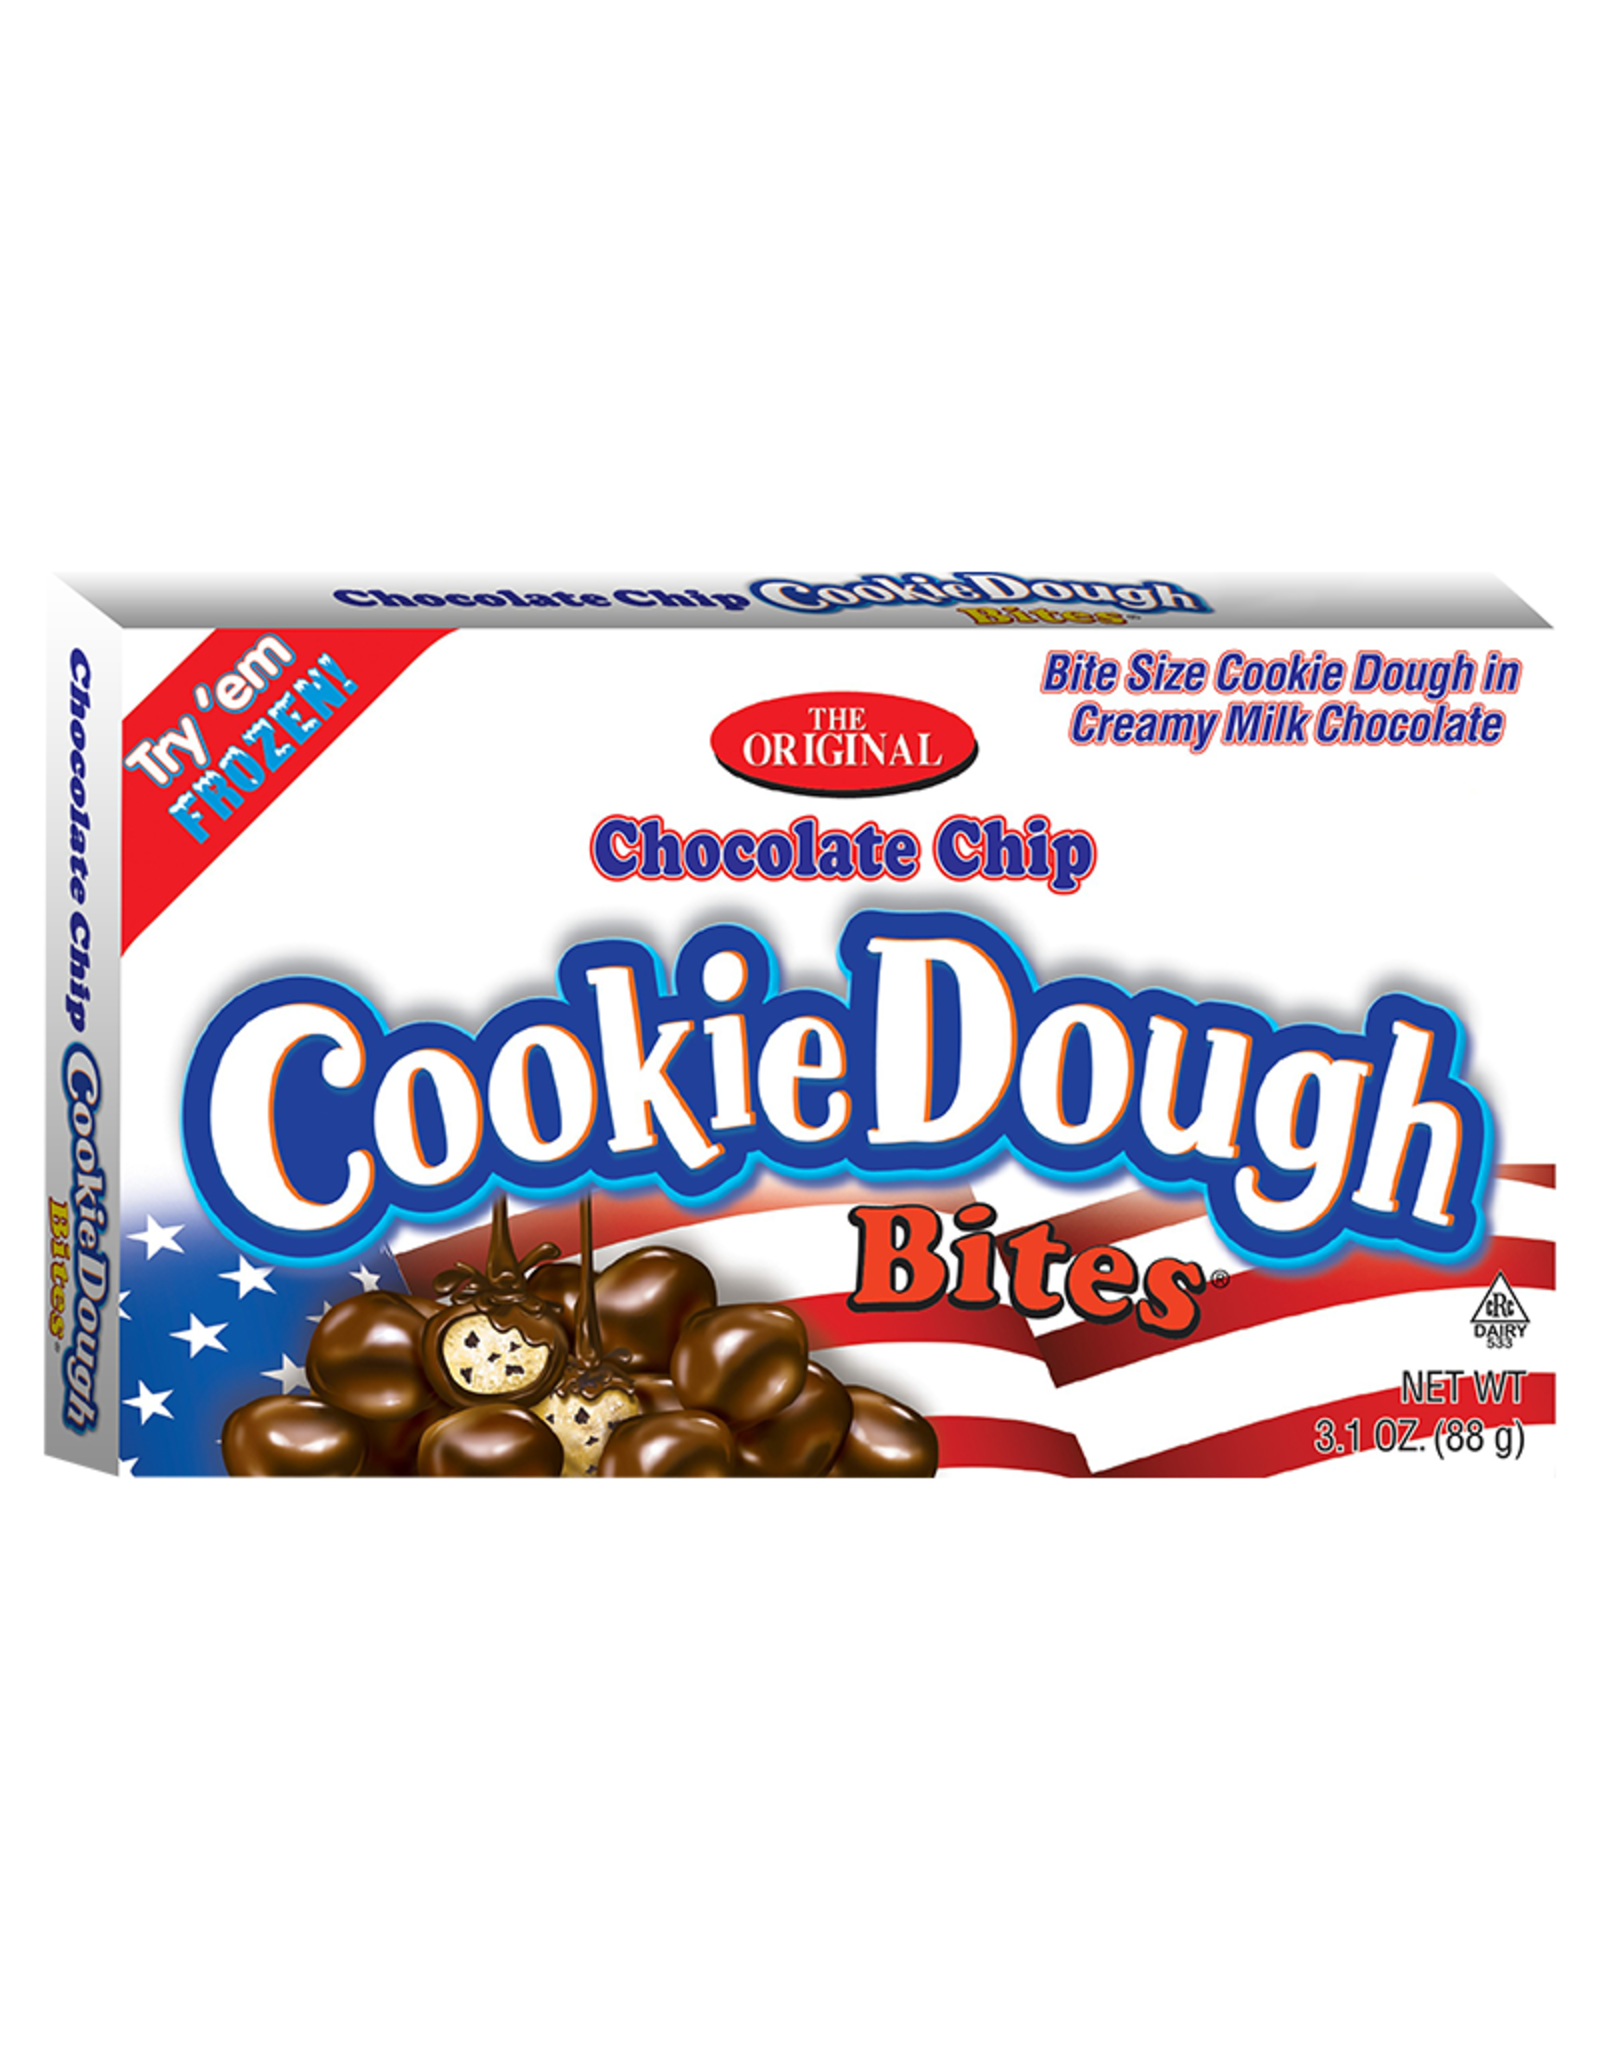 CookieDough Bites: Chocolate Chip Red, White & Blue - 88g